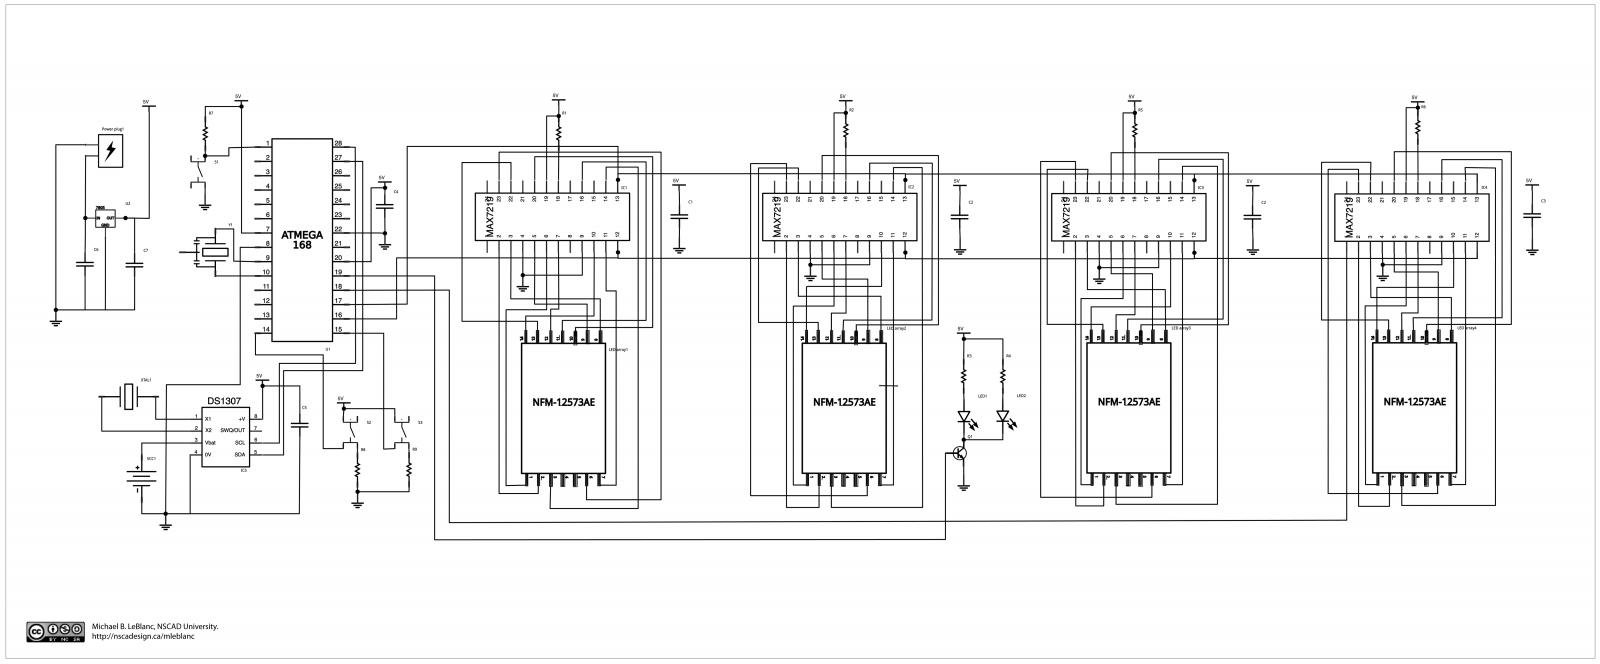 Panasonic Cq C1101u Wiring Diagram F150 Fuse Box Wiring Diagram – Diagram Schematic Transmission 2 Engine94